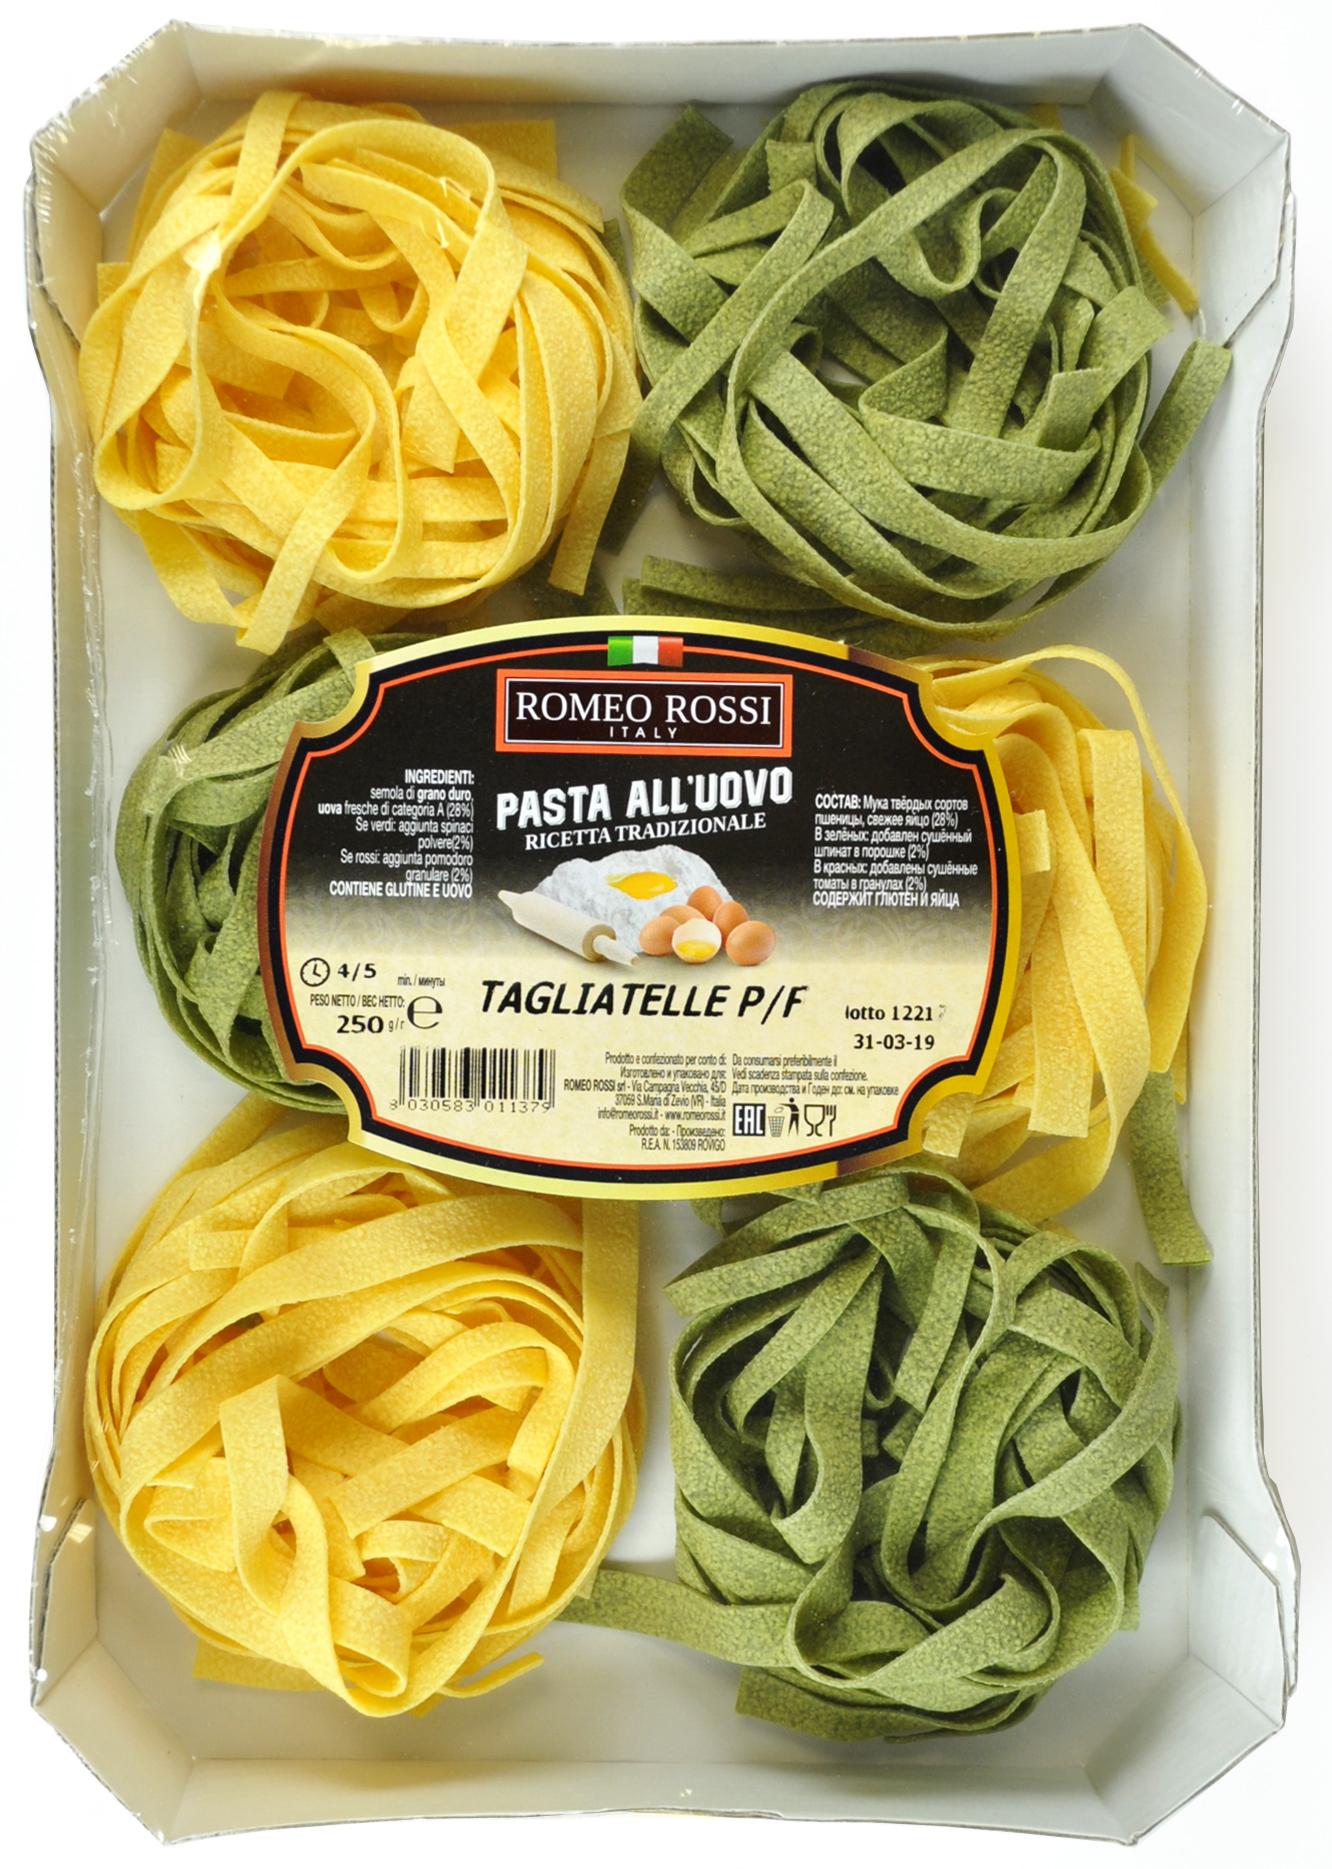 Romeo Rossi паста яичная 8 яиц тальятелле двухцветные, 250 г